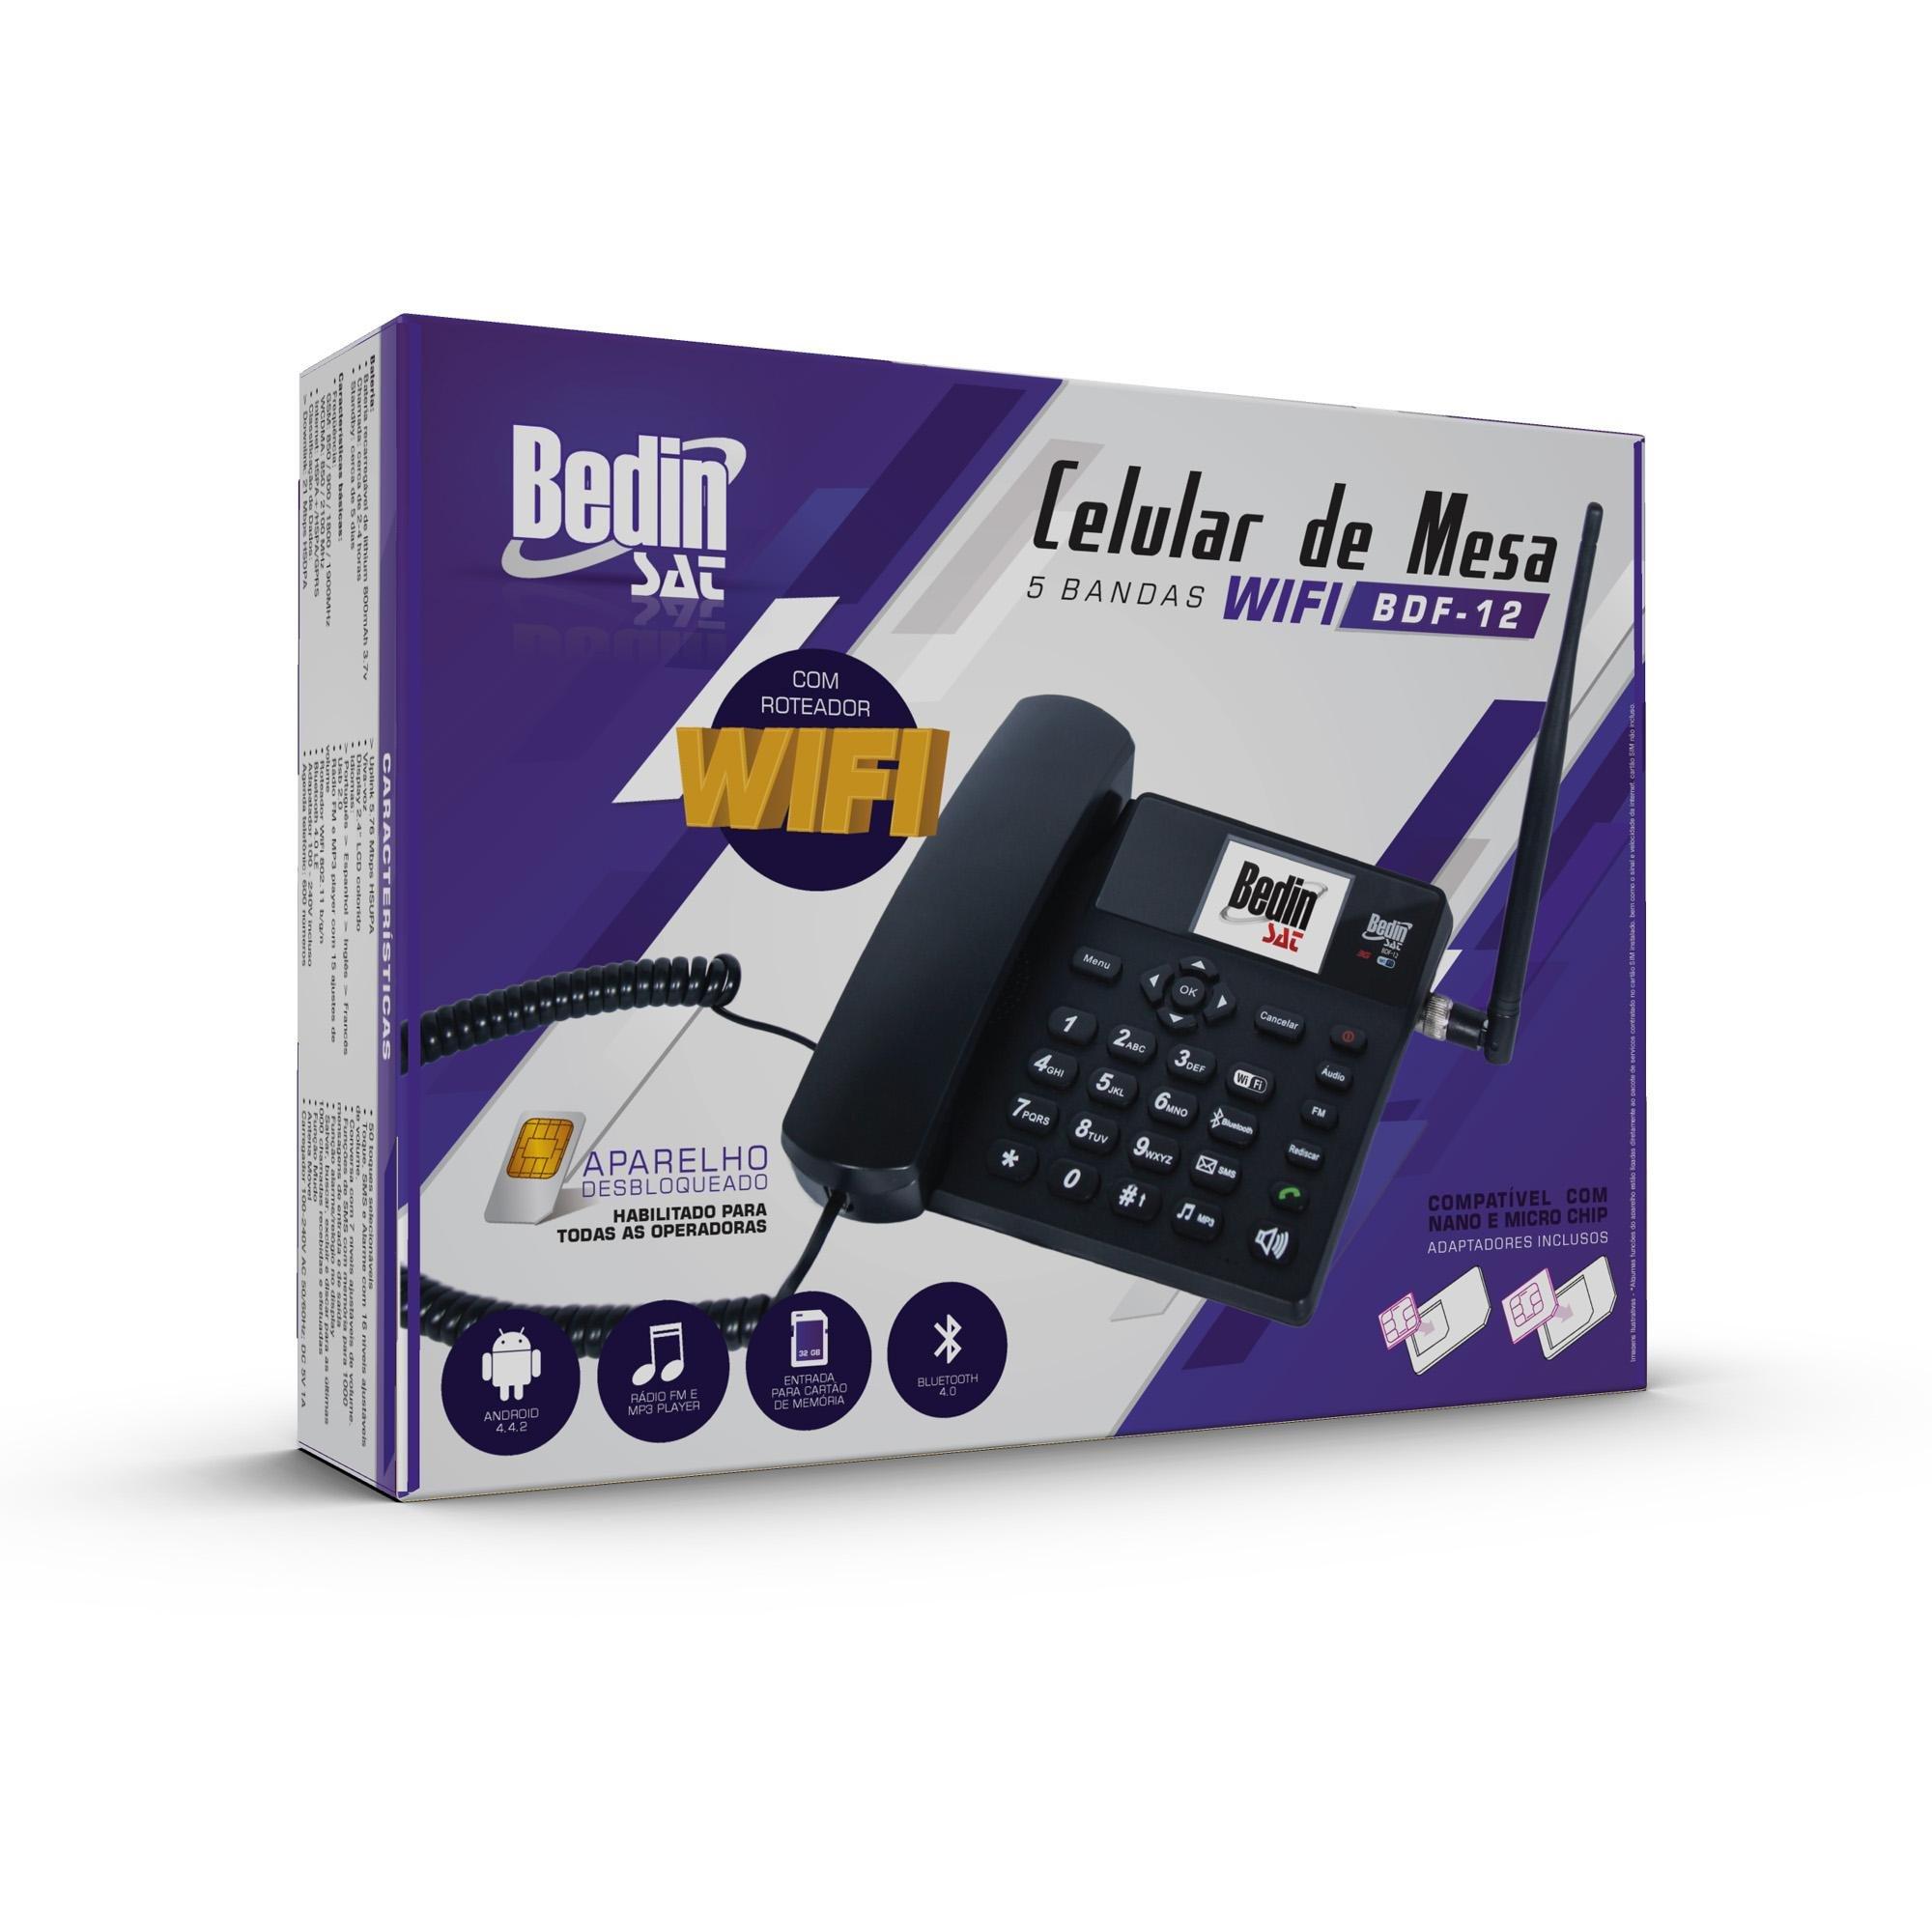 Telefone Celular de Mesa Wifi 3G BDF-12 Preto BEDINSAT